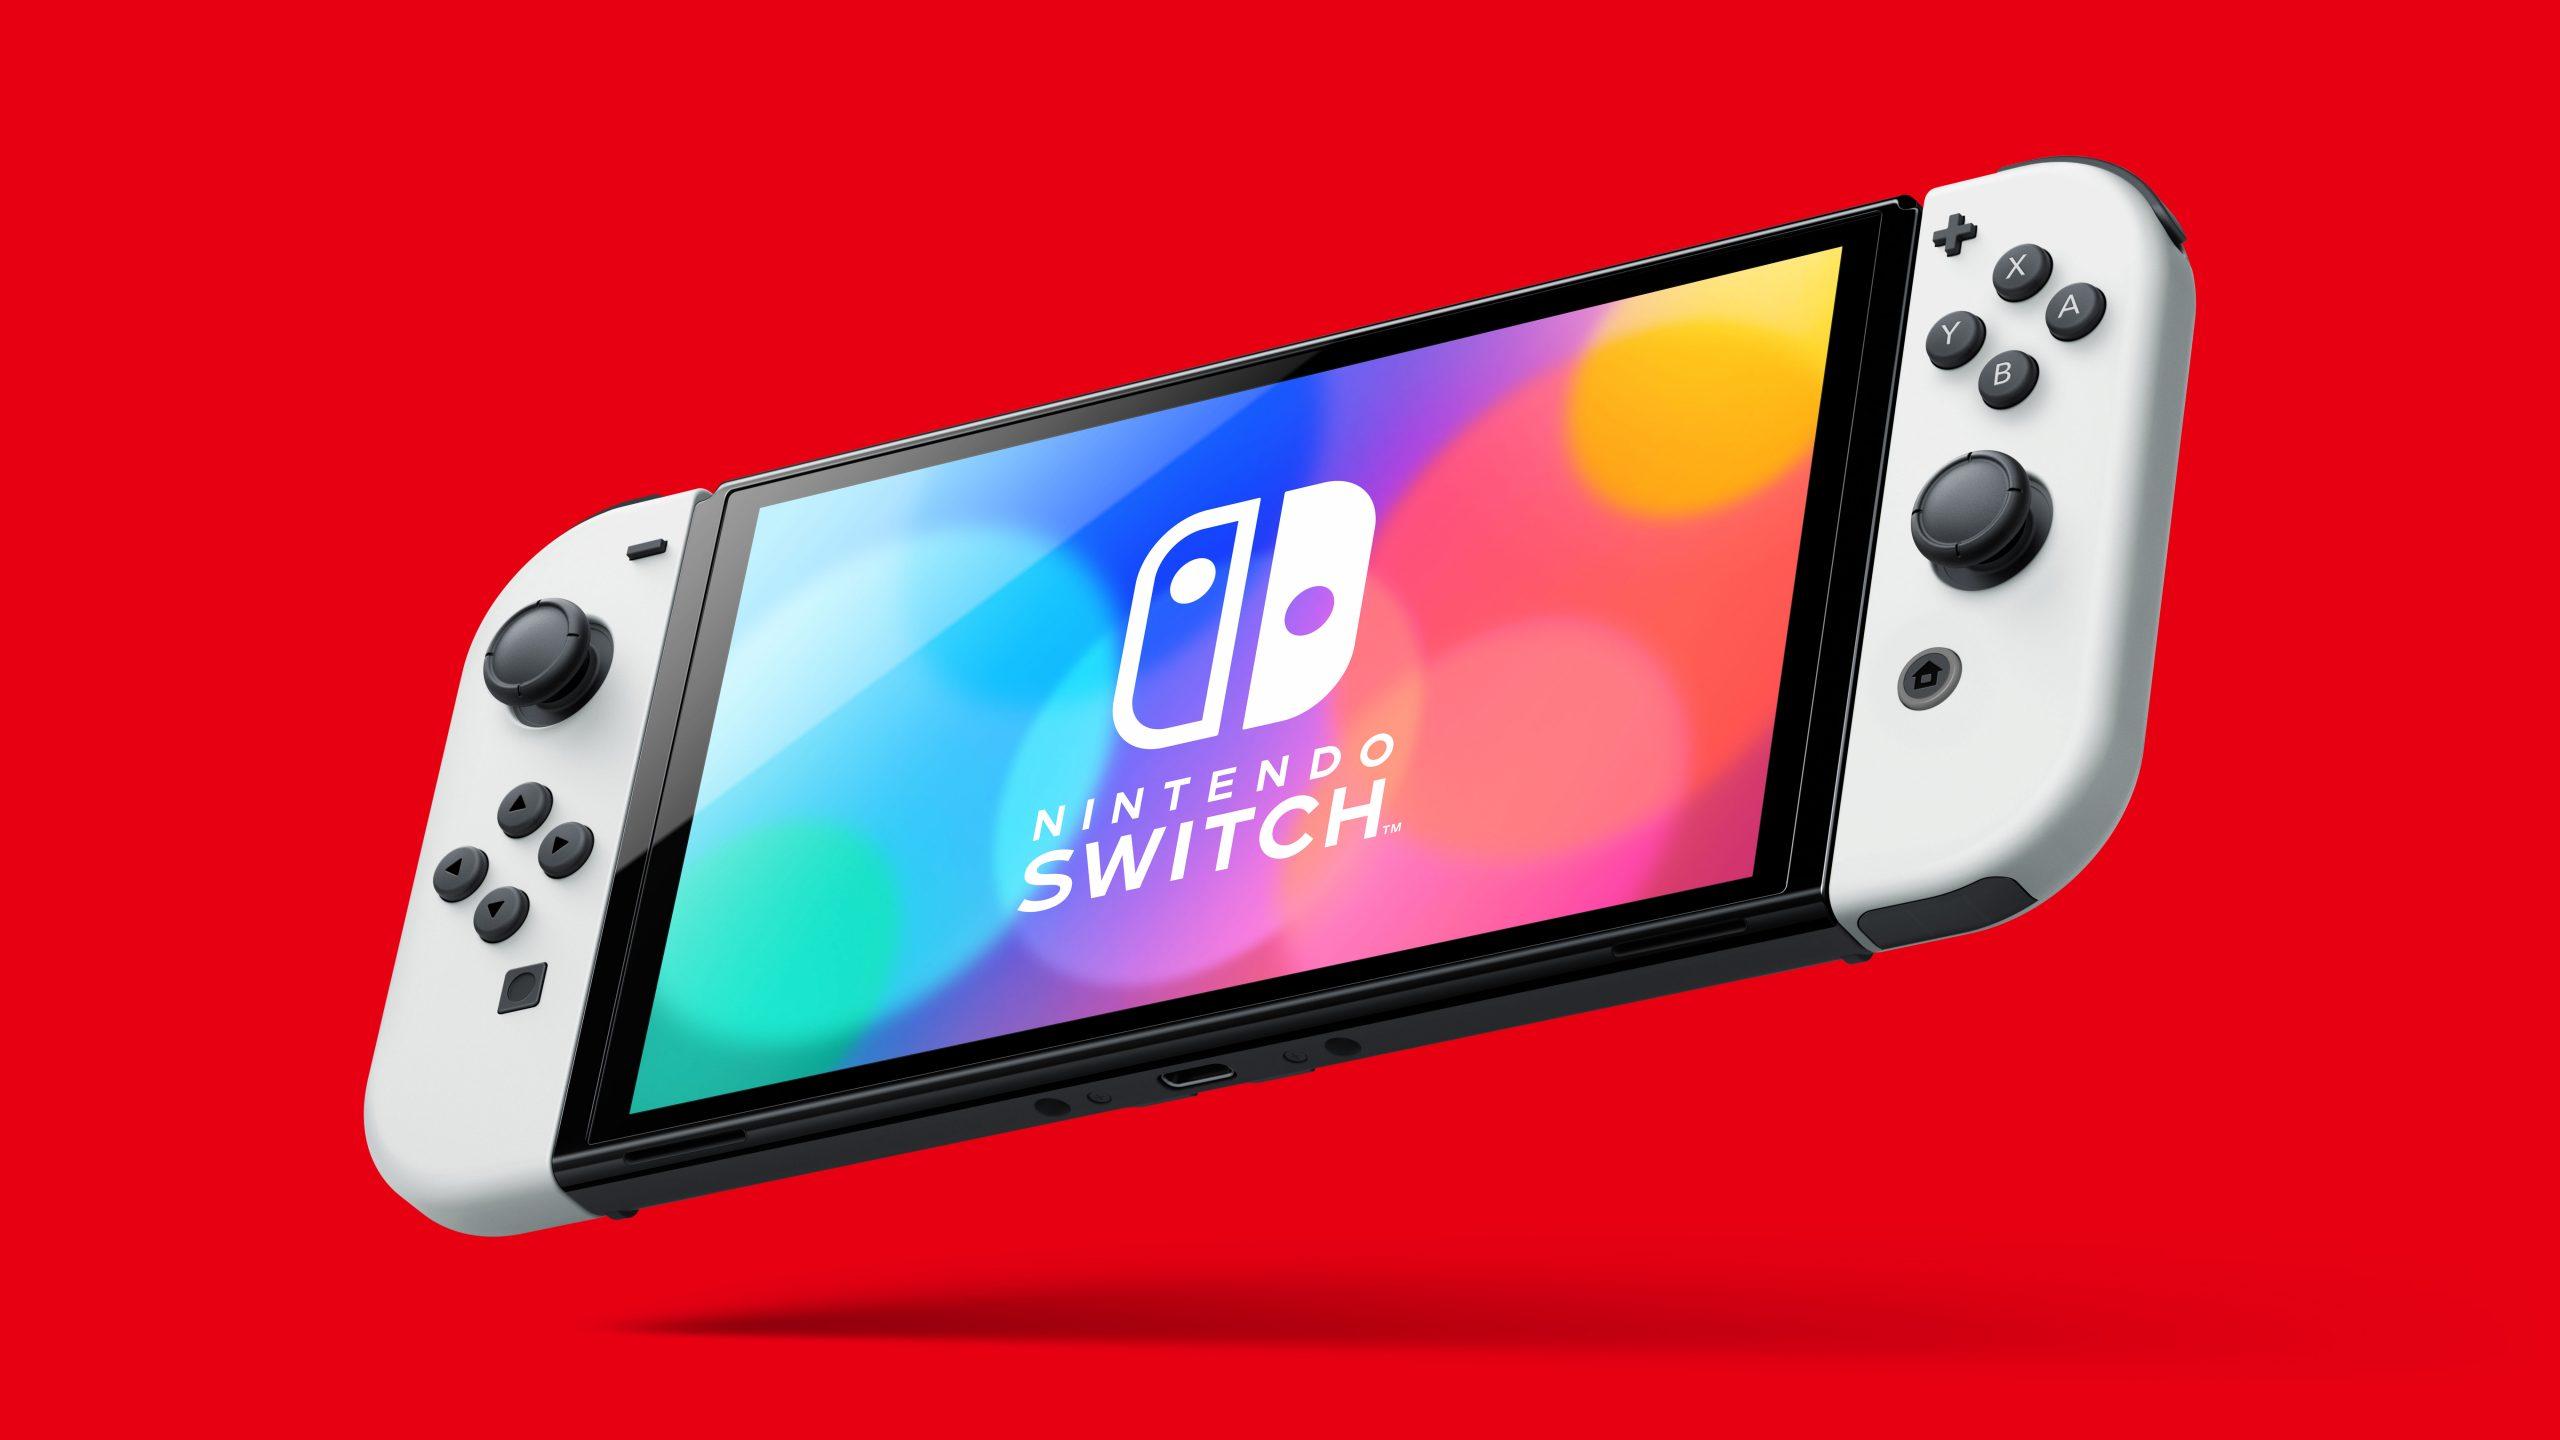 Nintendo Switch (OLED version)